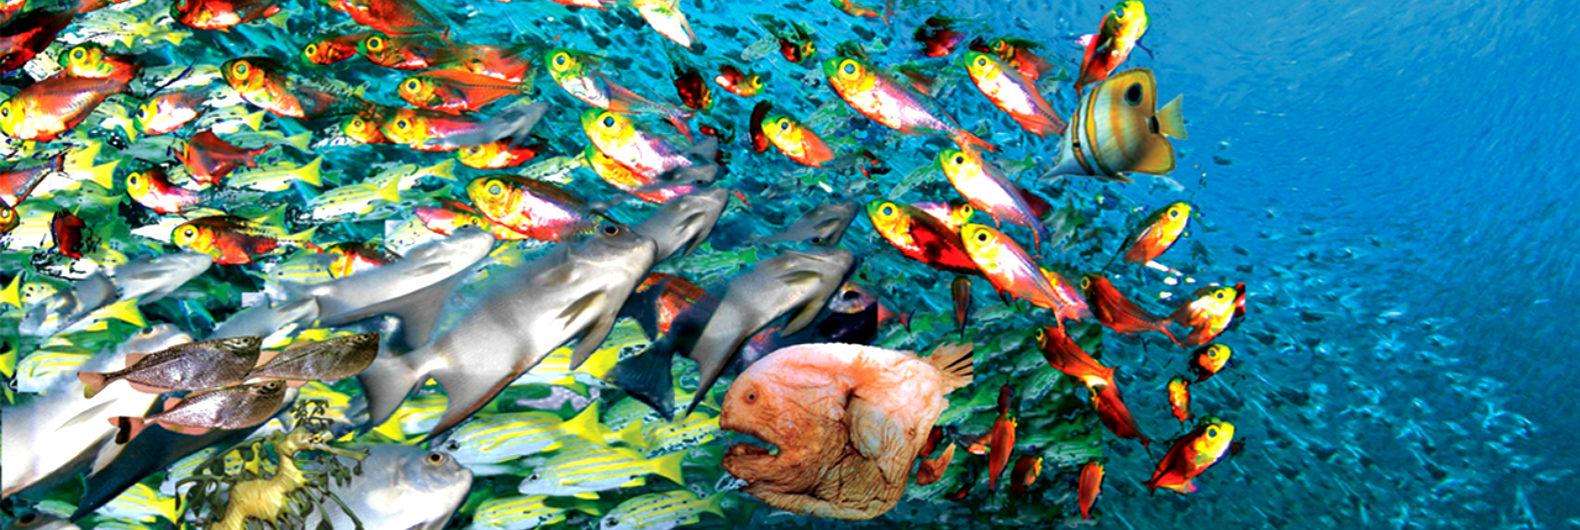 fish-populations-1580x530